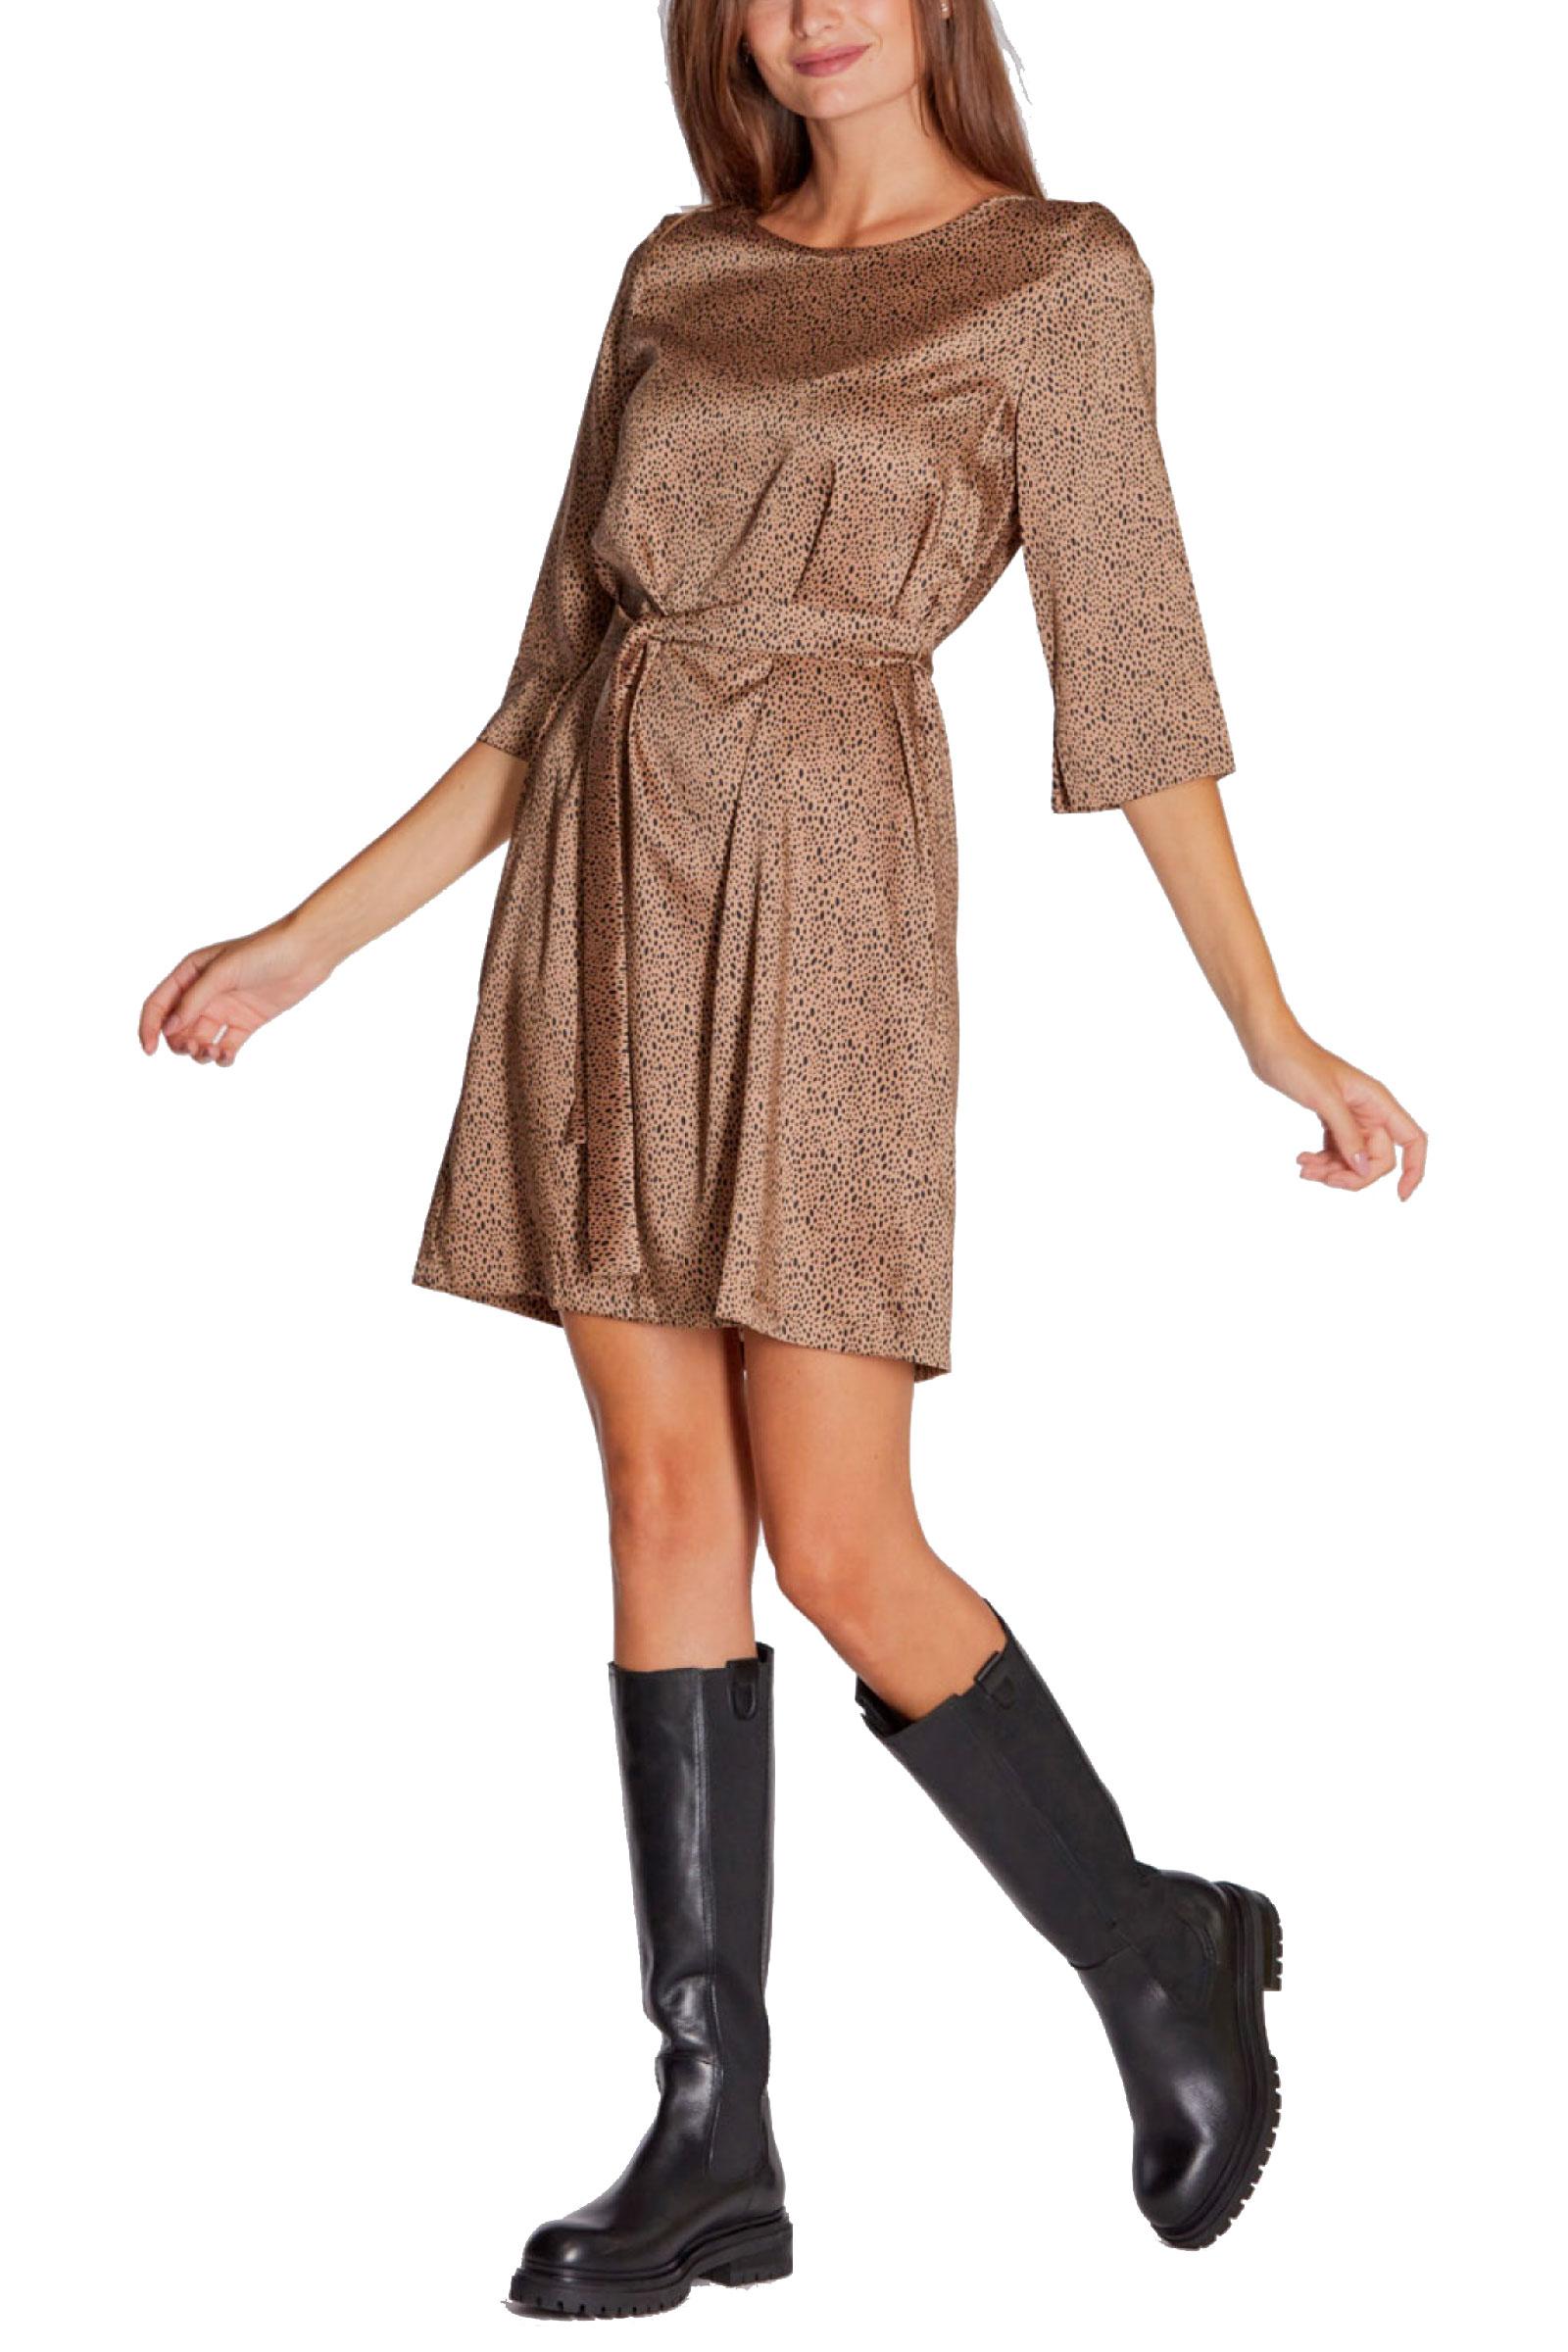 EMME MARELLA   Dress   52262419200005